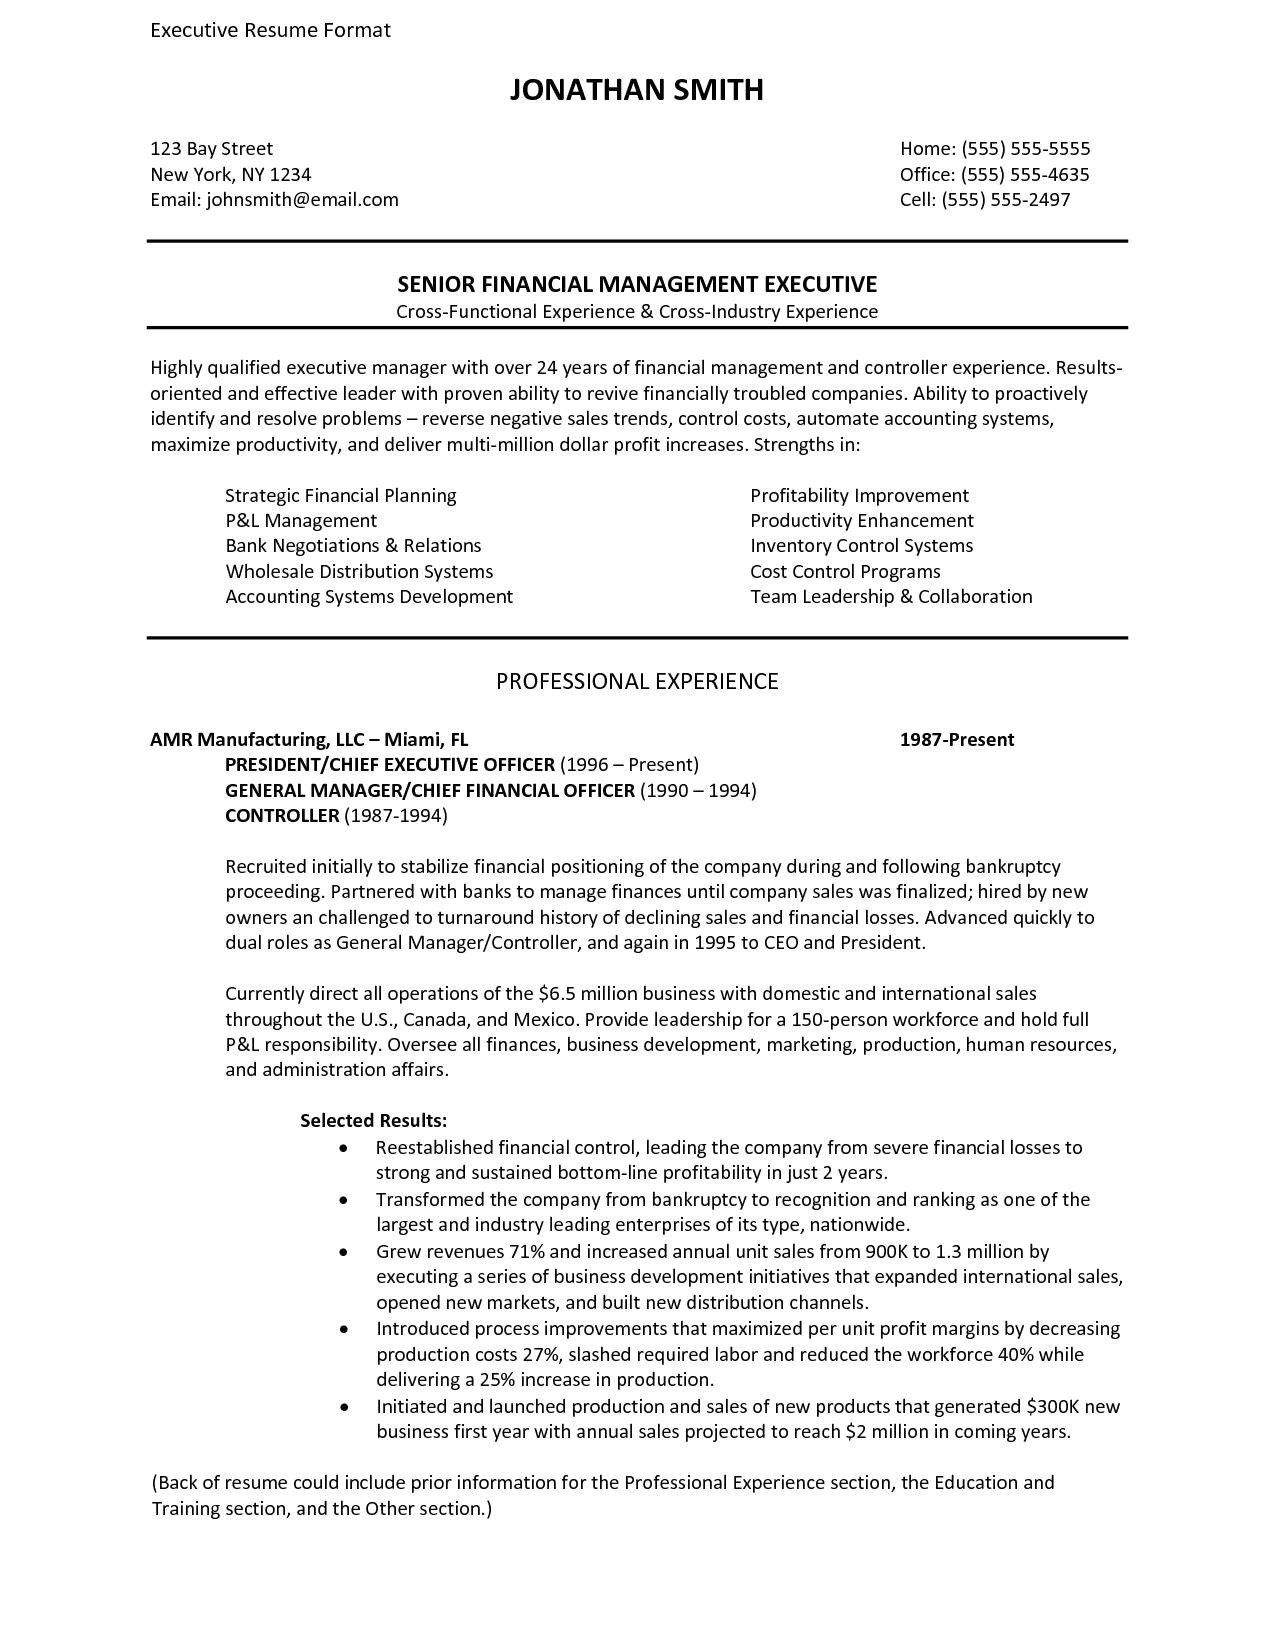 telecom sales executive resume sample